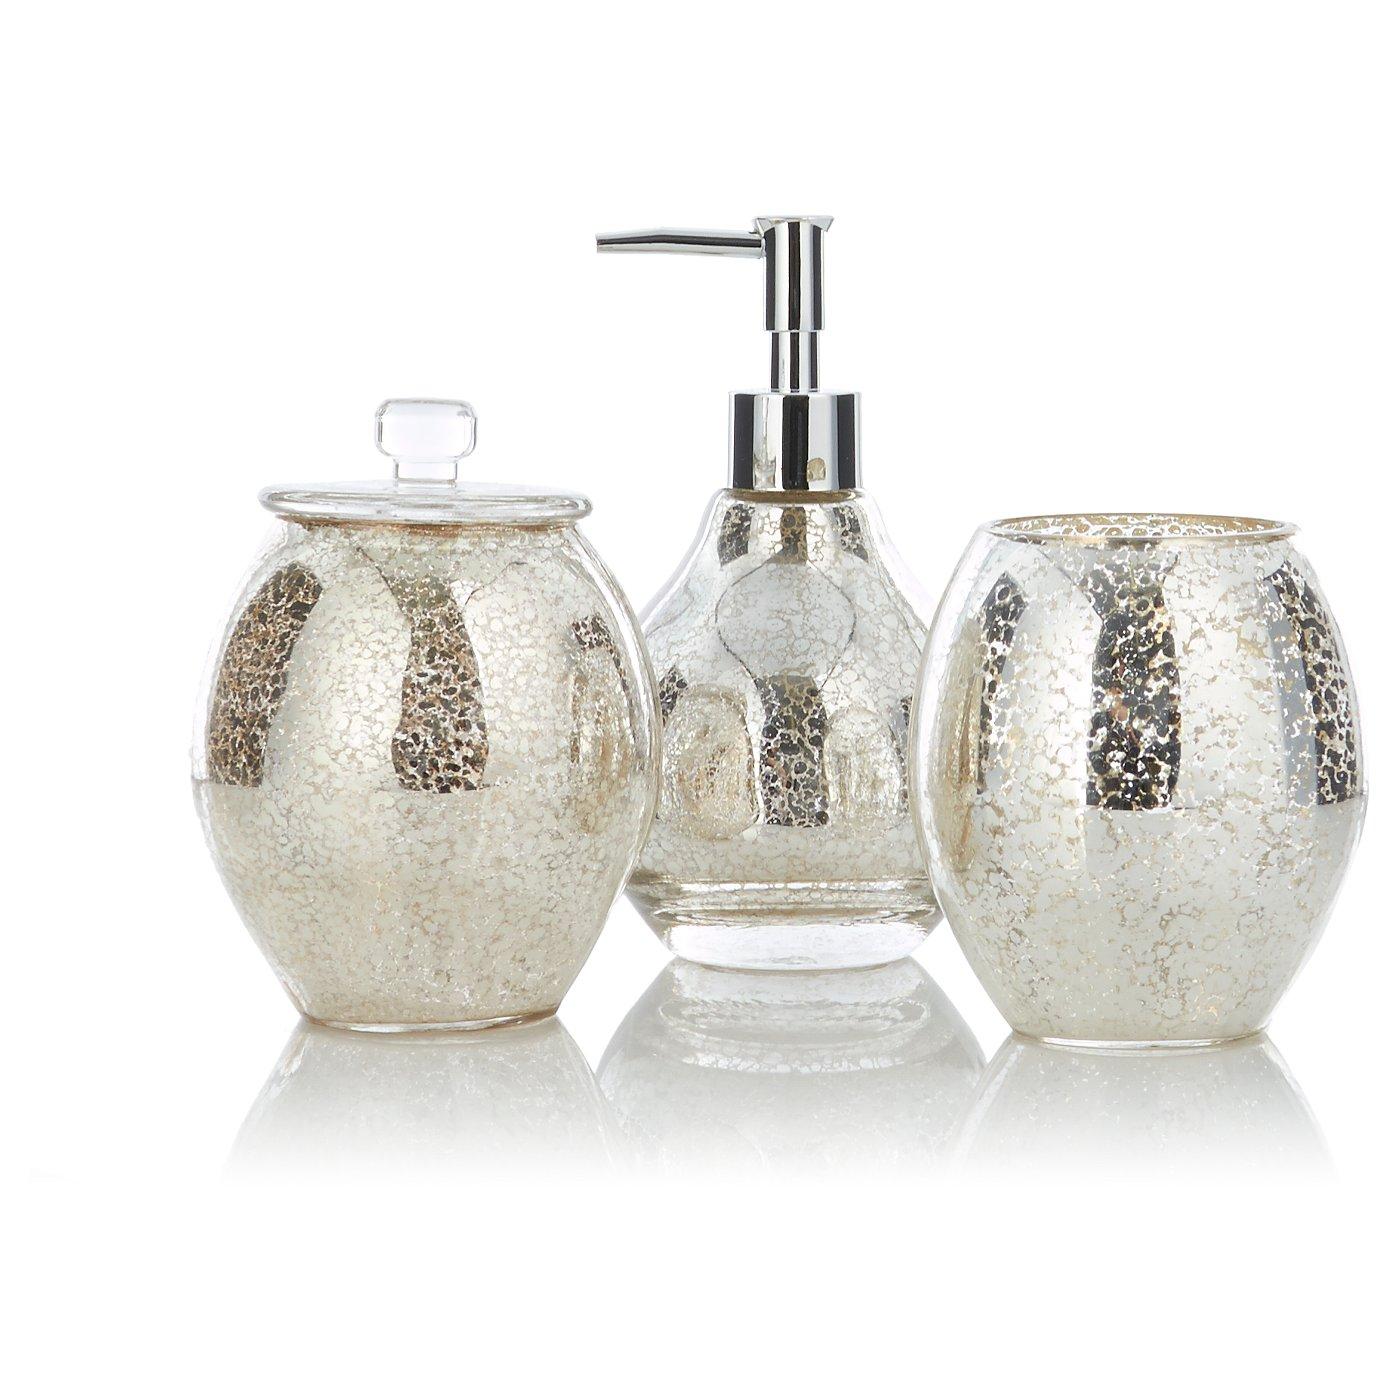 ice accessories hayneedle set paradigm product bathroom glass piece master cfm trends